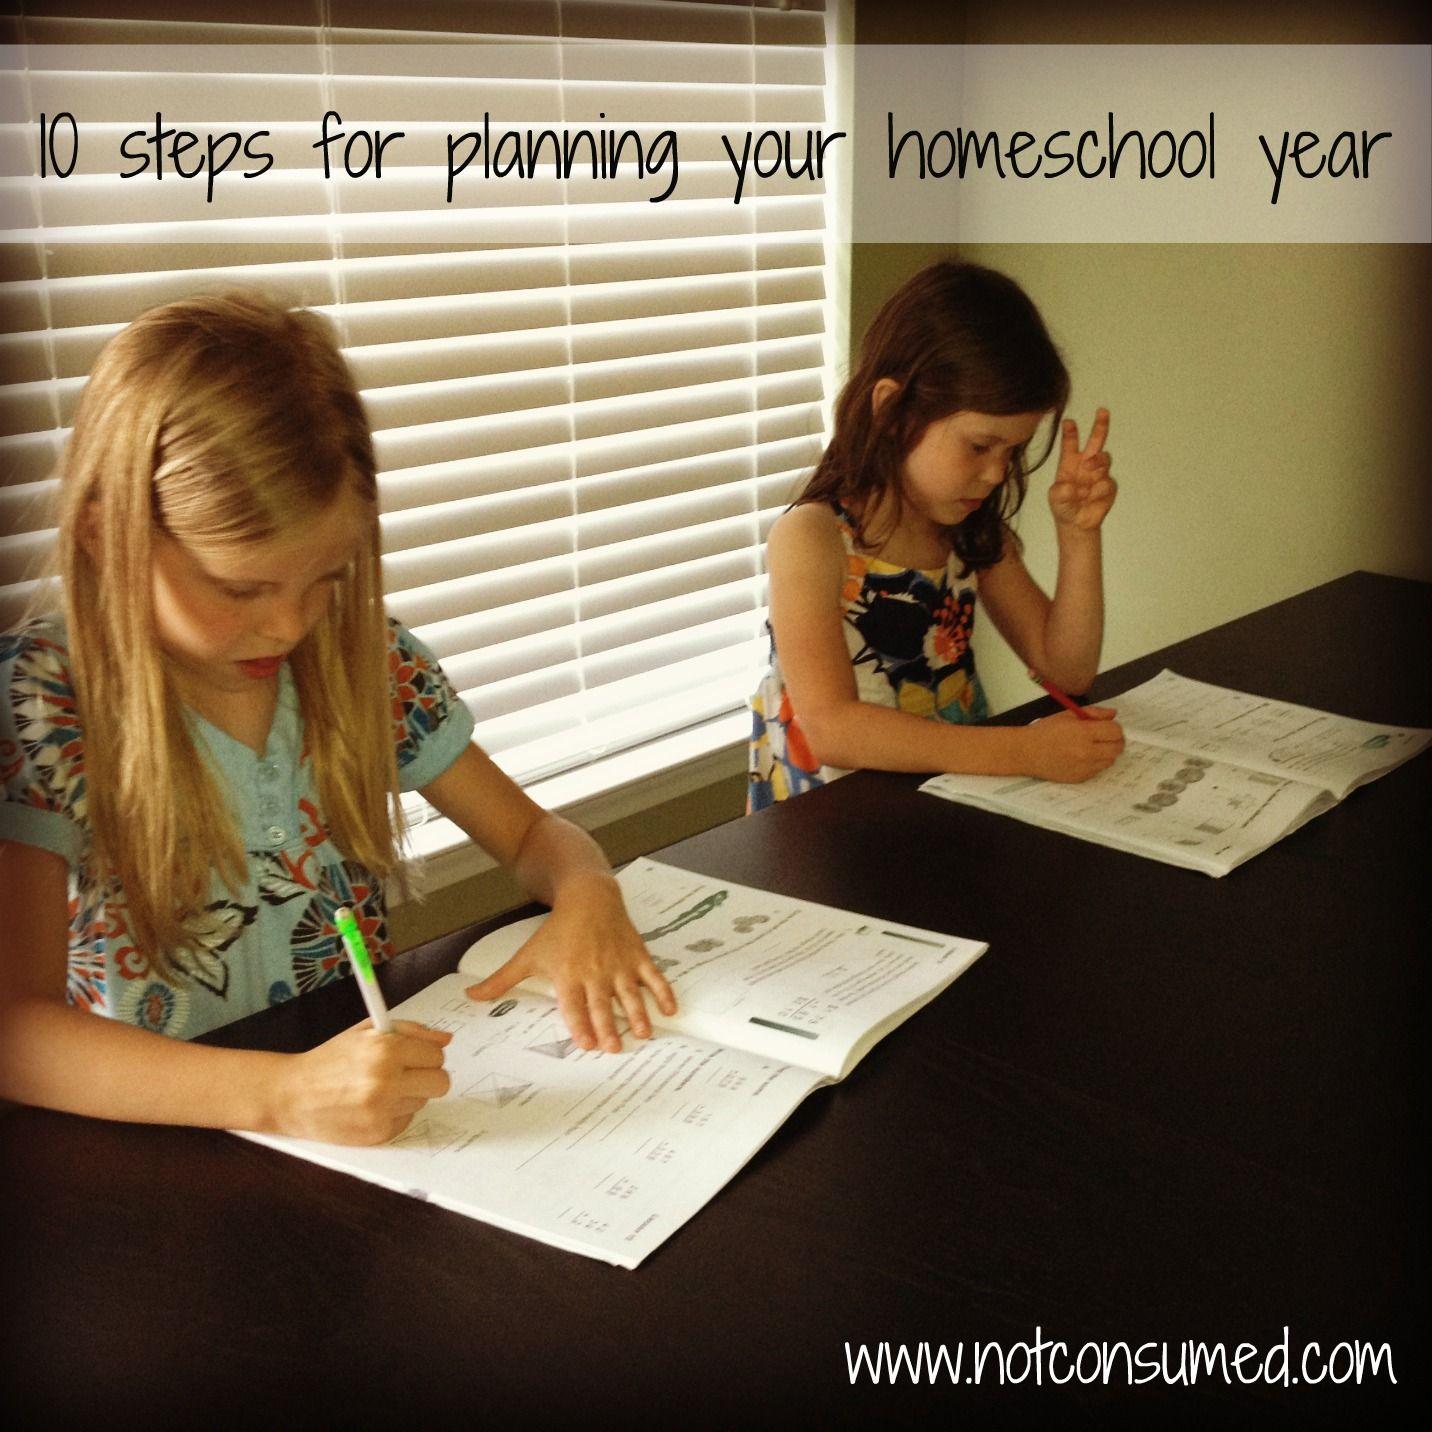 Minimalist Homeschool Room: 10 Steps For Planning Your Homeschool Year